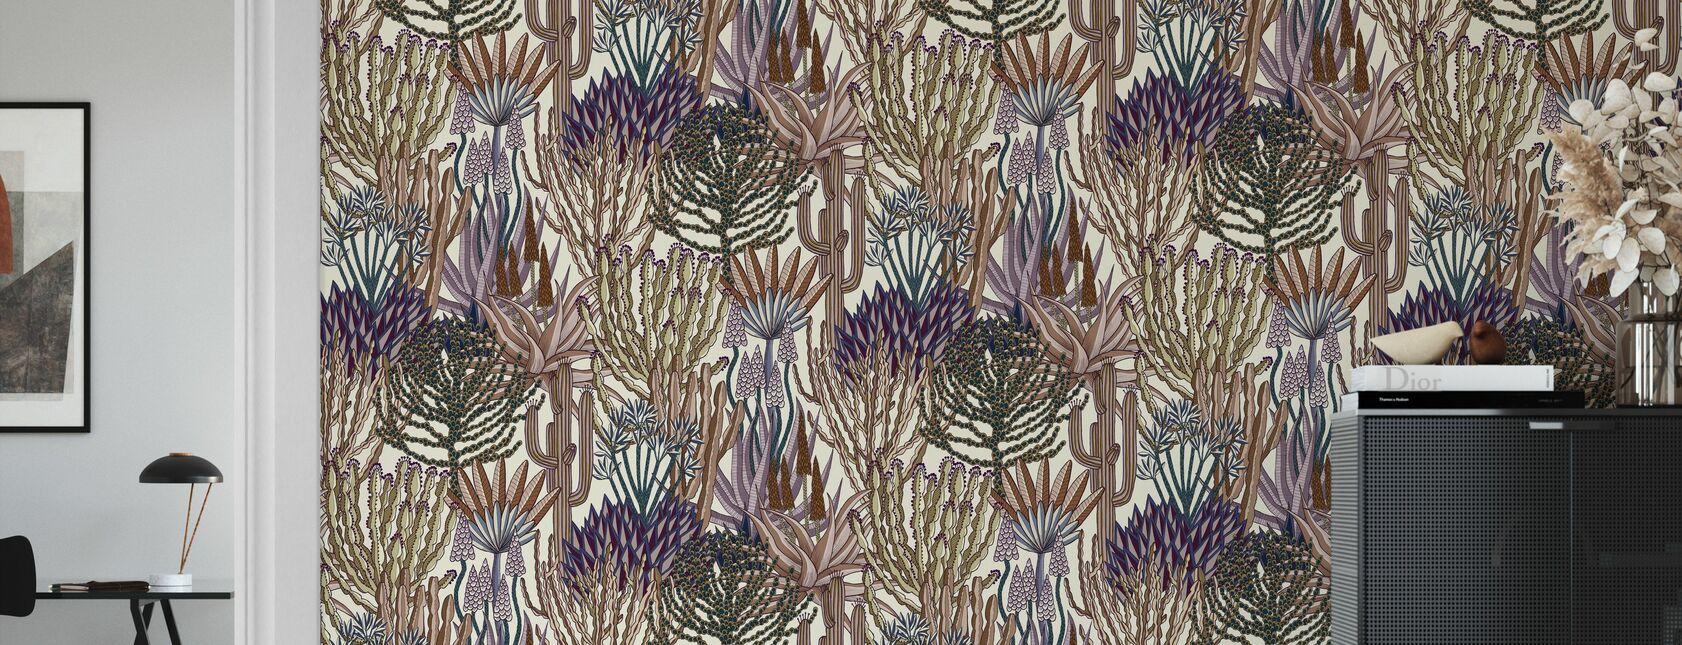 Euphorbia Forest - Carnival - Wallpaper - Living Room